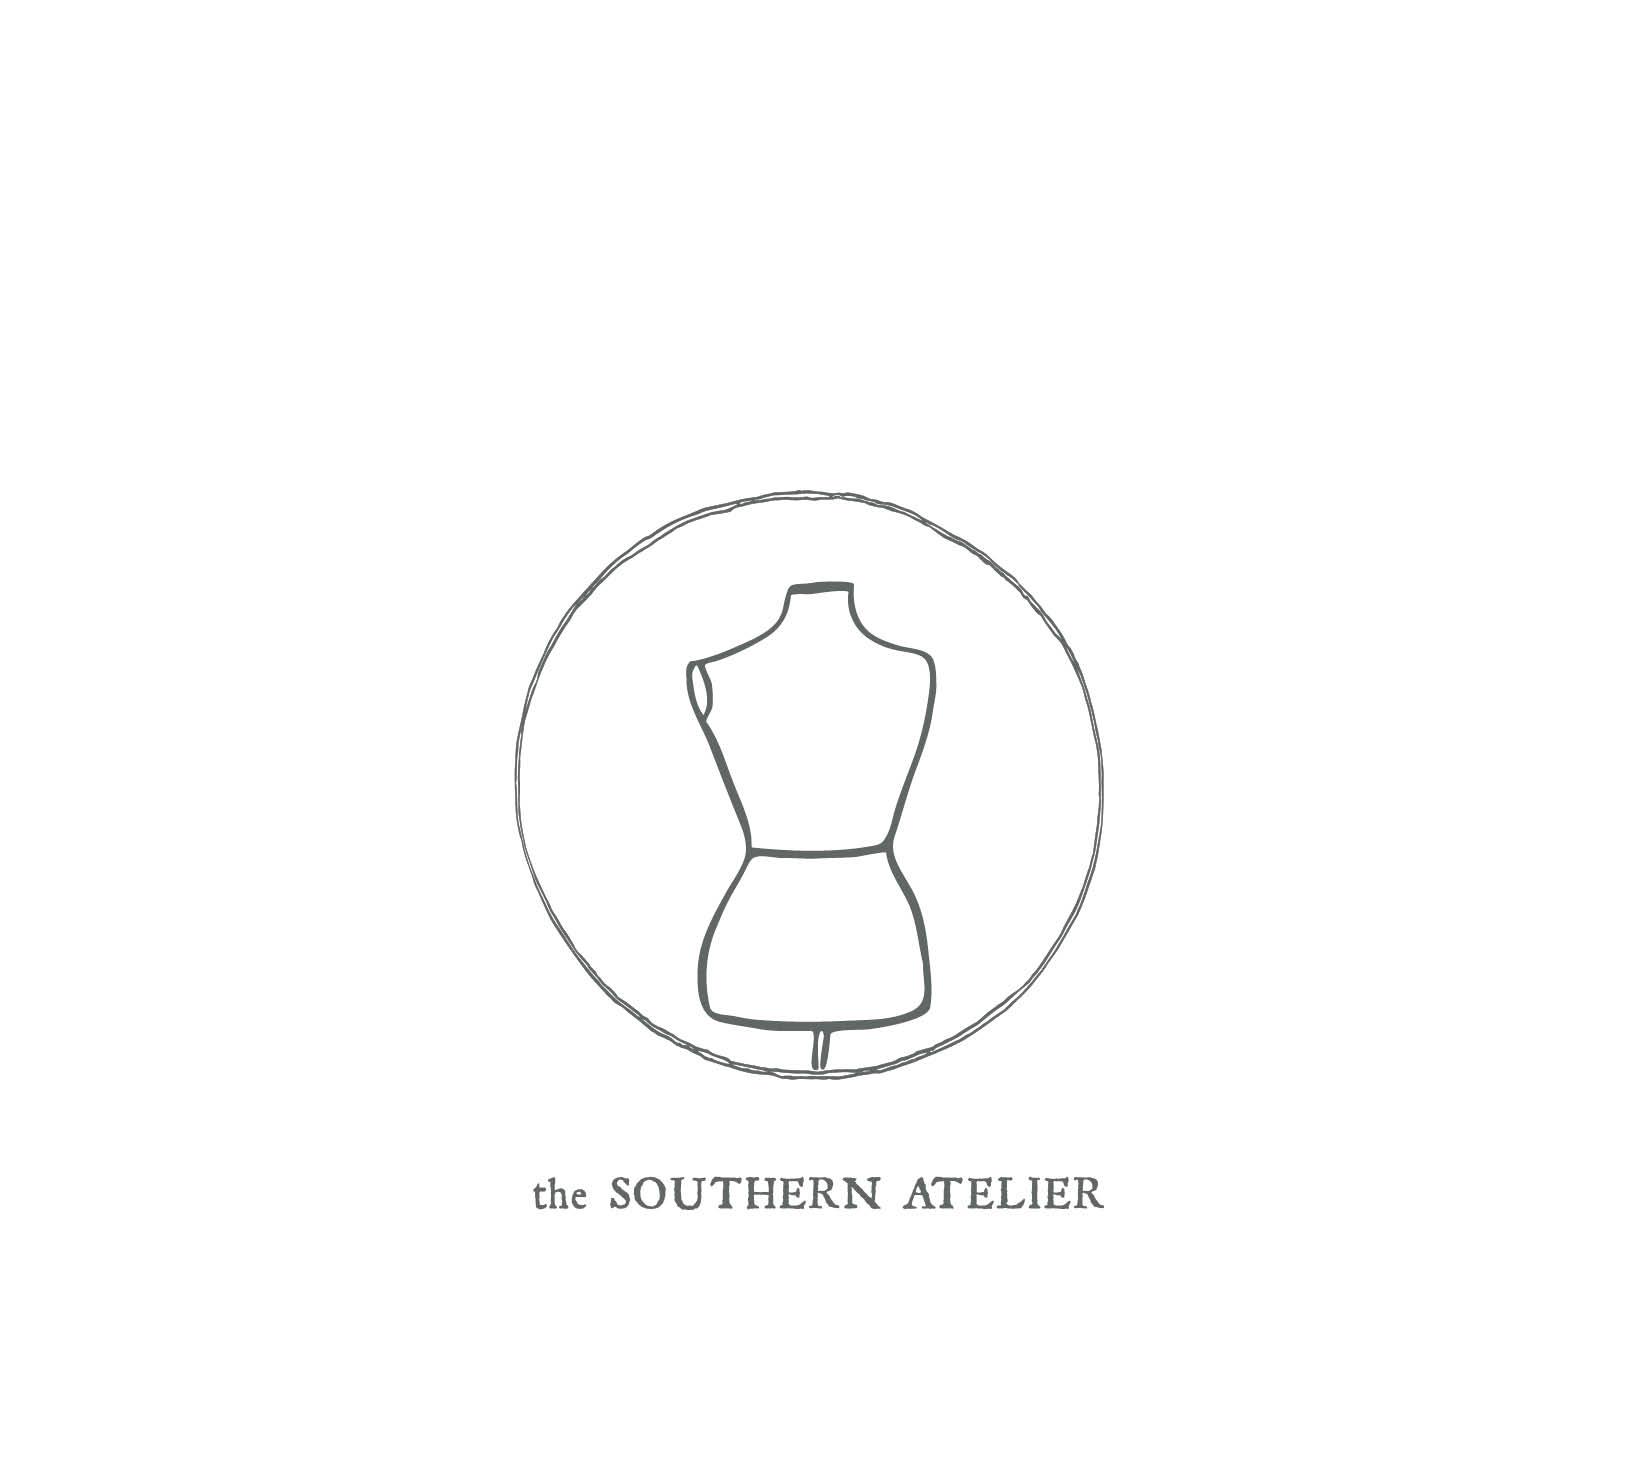 southernateliersmallforsite.jpg